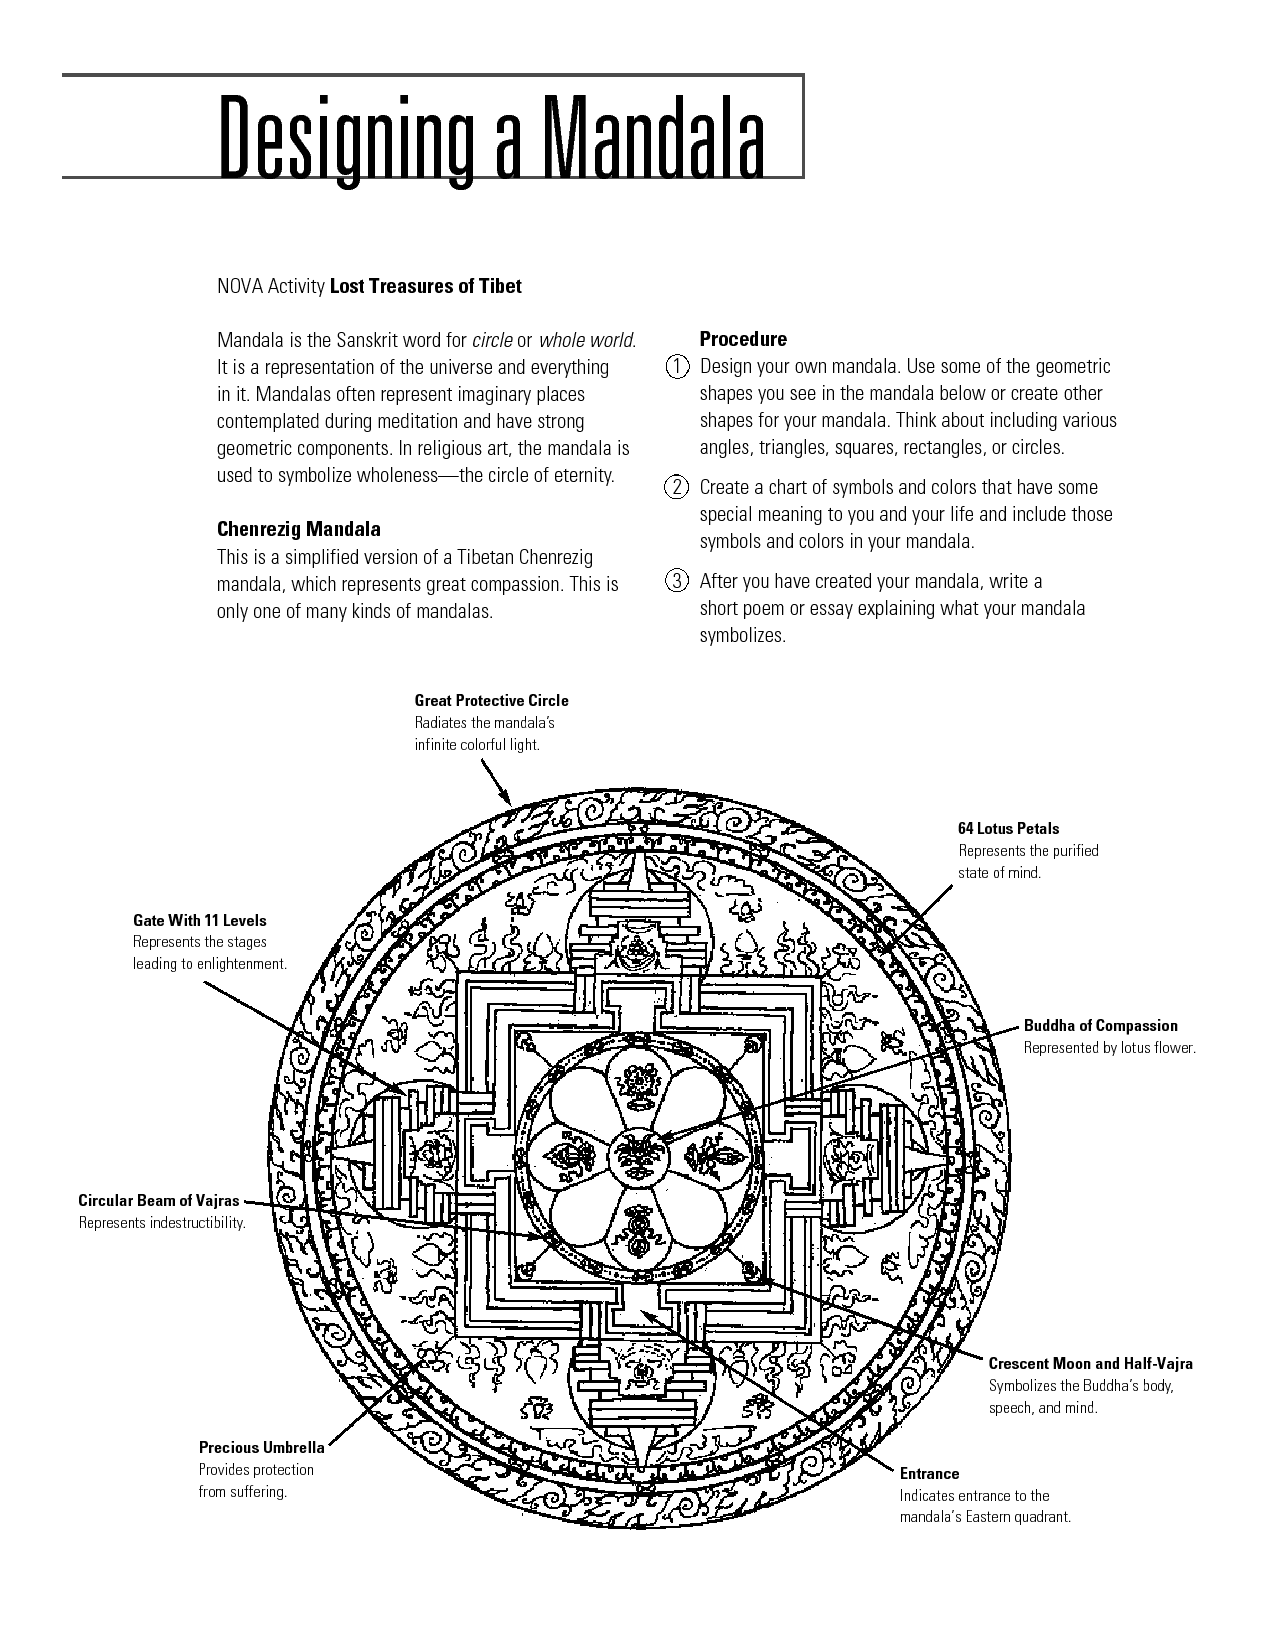 How Do Draw My Own Mandala